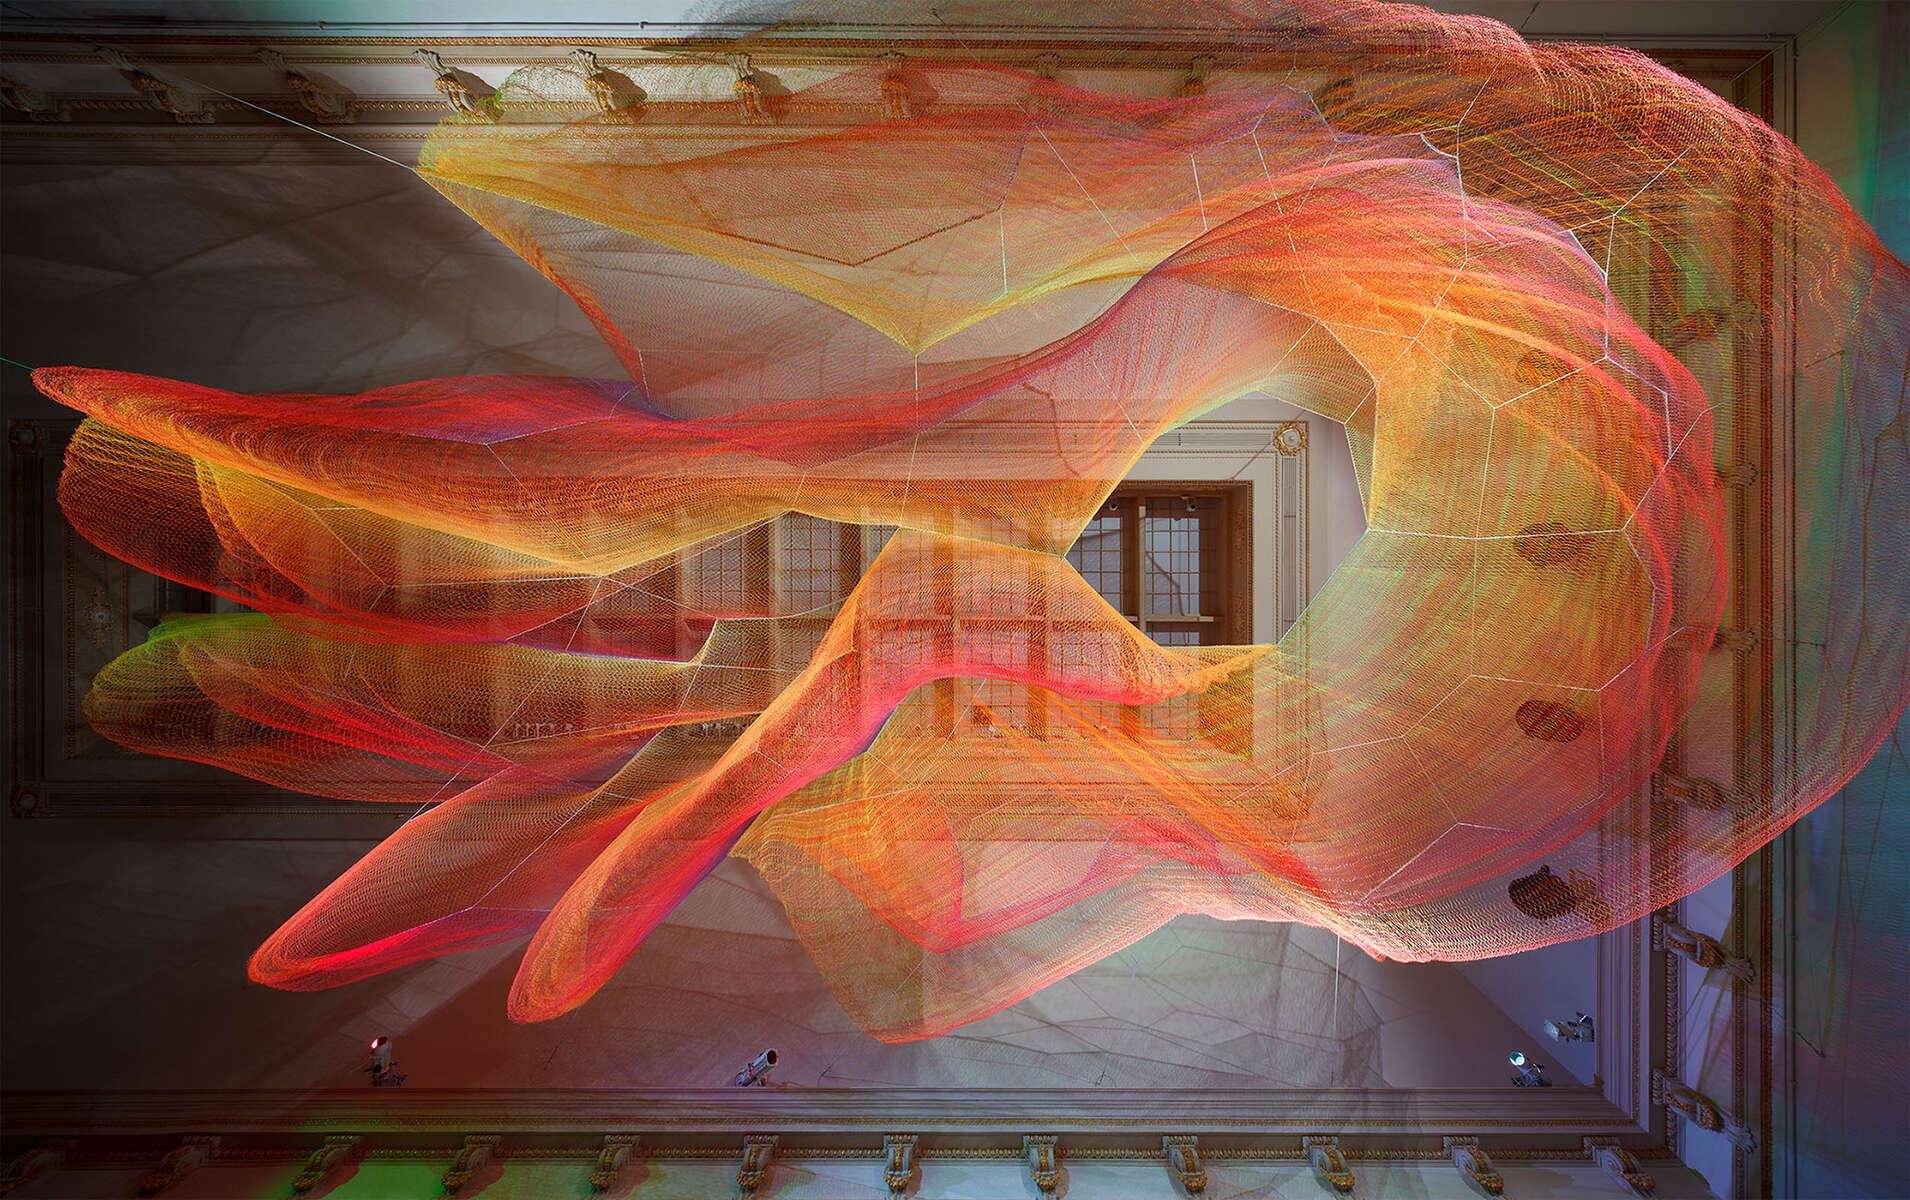 1.8Janet EchelmanRenwick GallerySmithsonian American Art MuseumWashington, DCJanet Echelman1.8WONDER Exhibition 2015-16